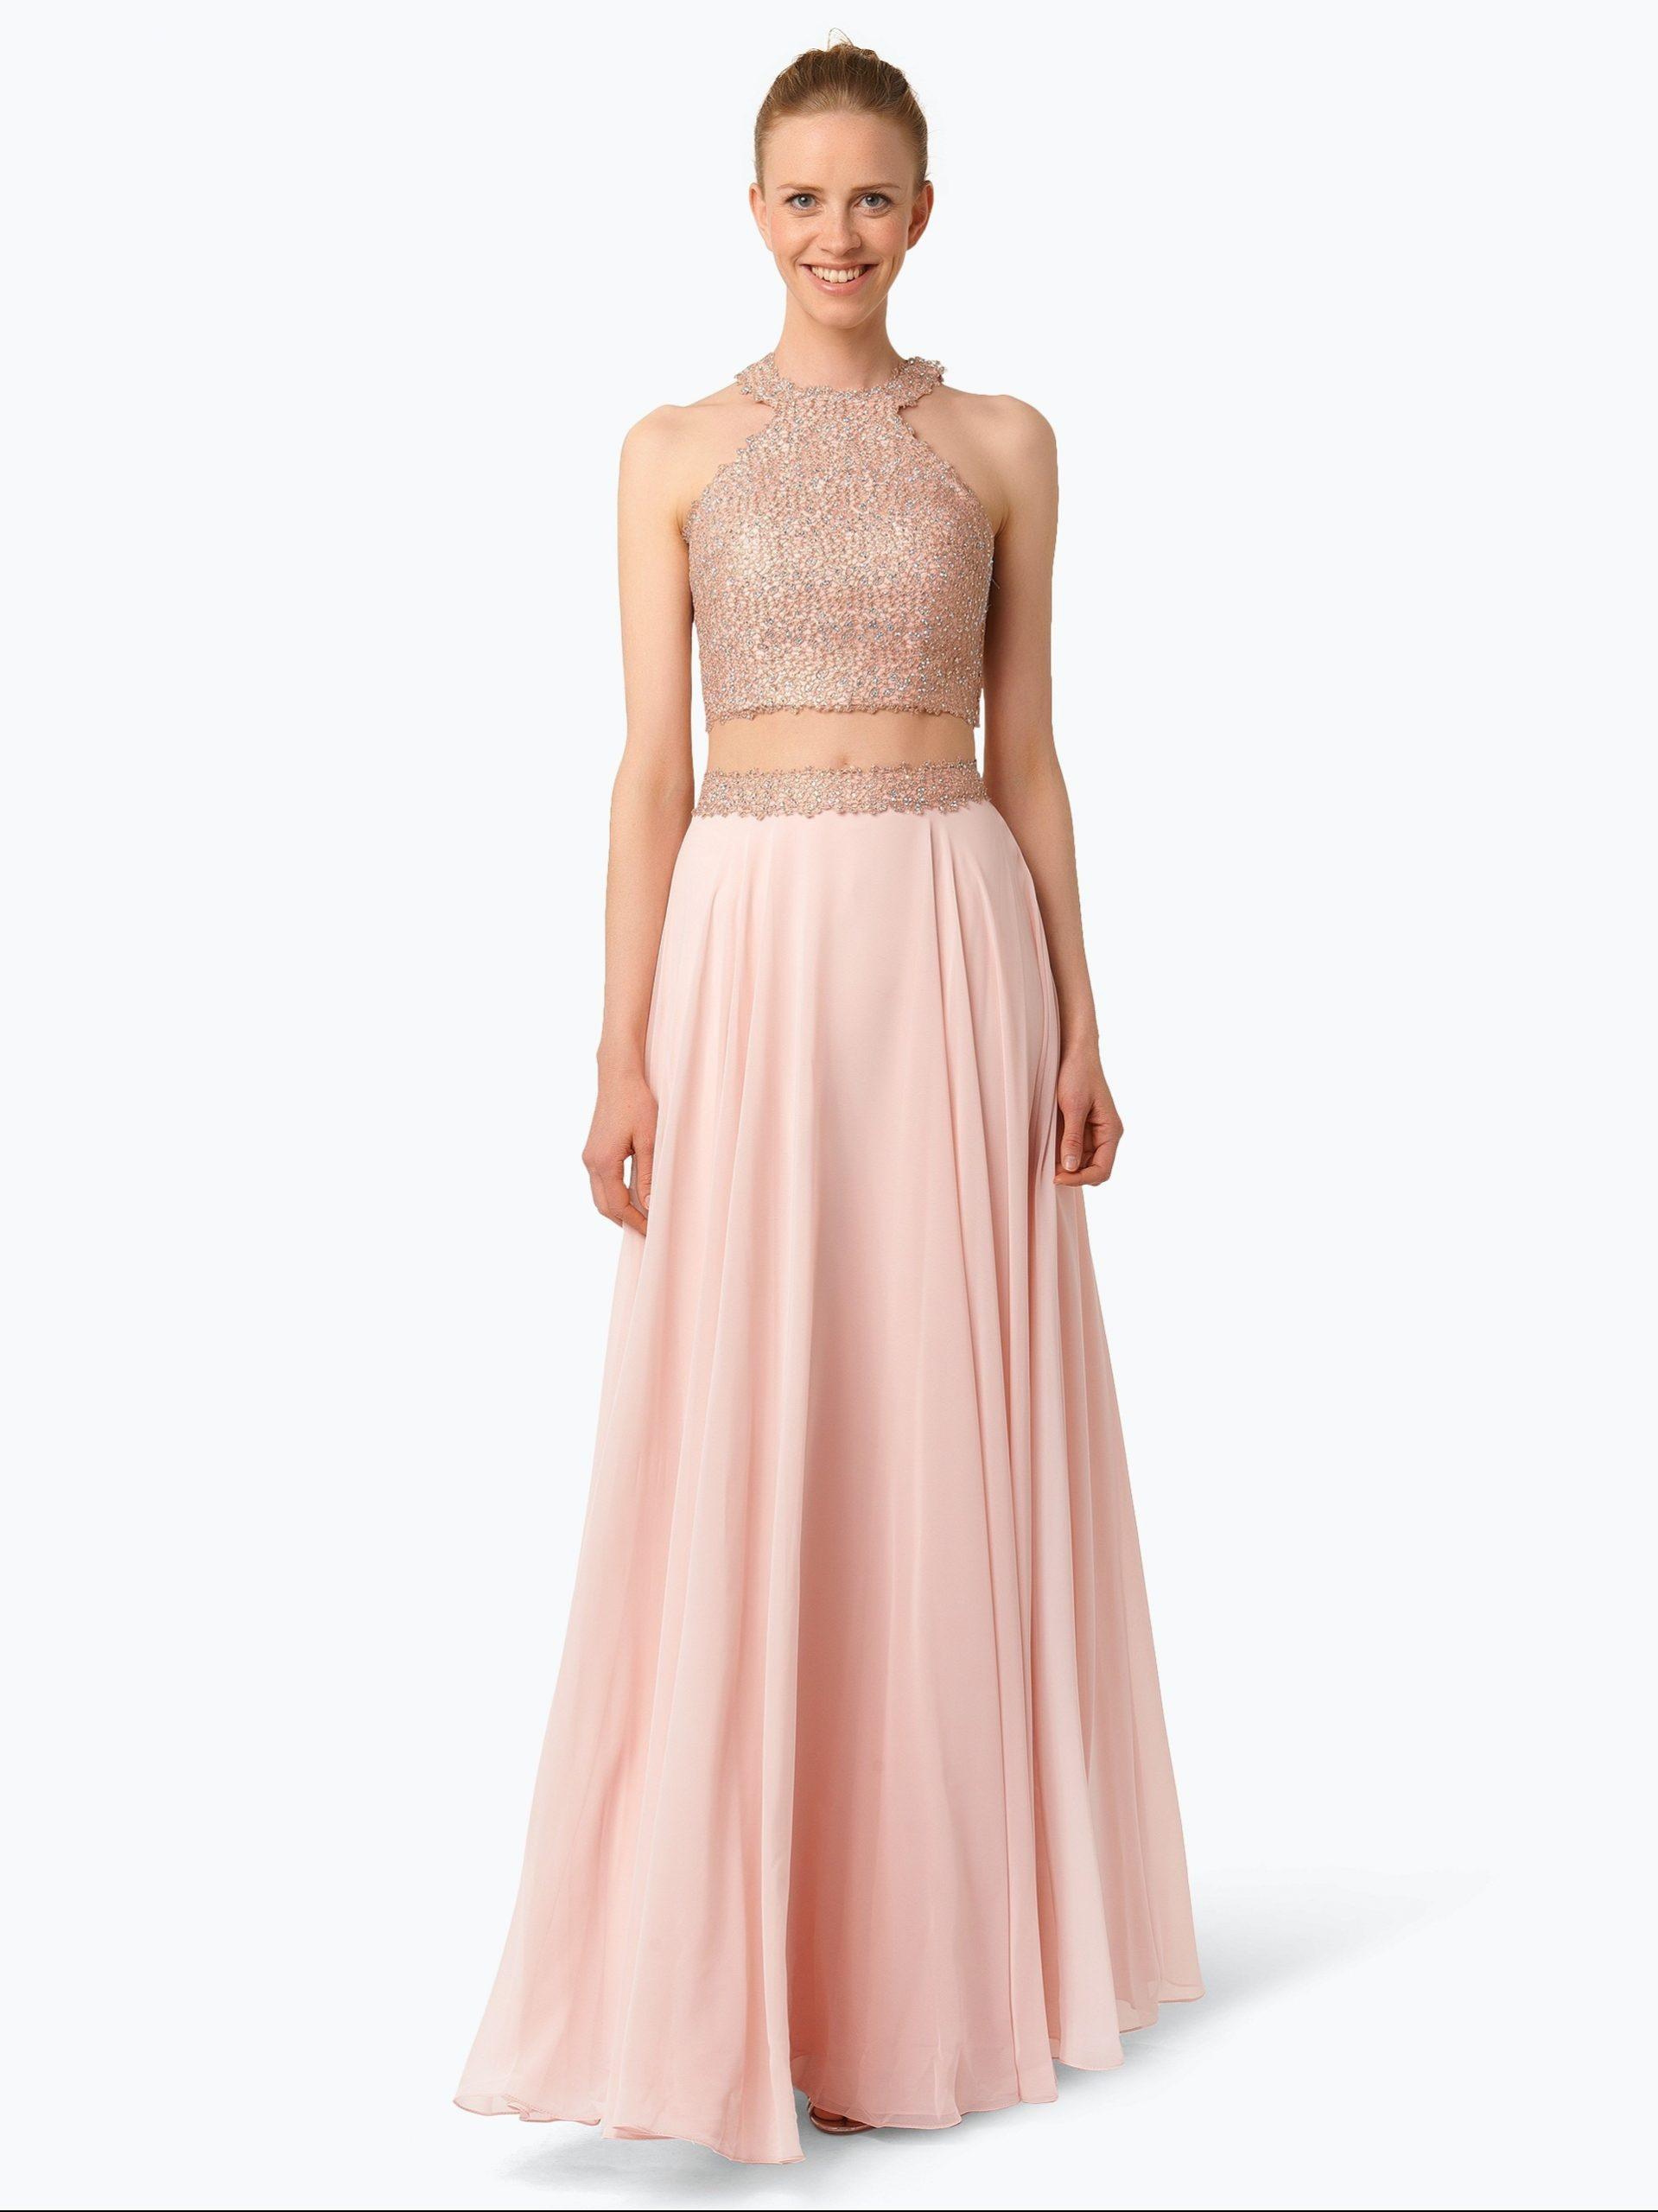 11 Luxus Abendkleid Zweiteilig Lang Bester Preis - Abendkleid